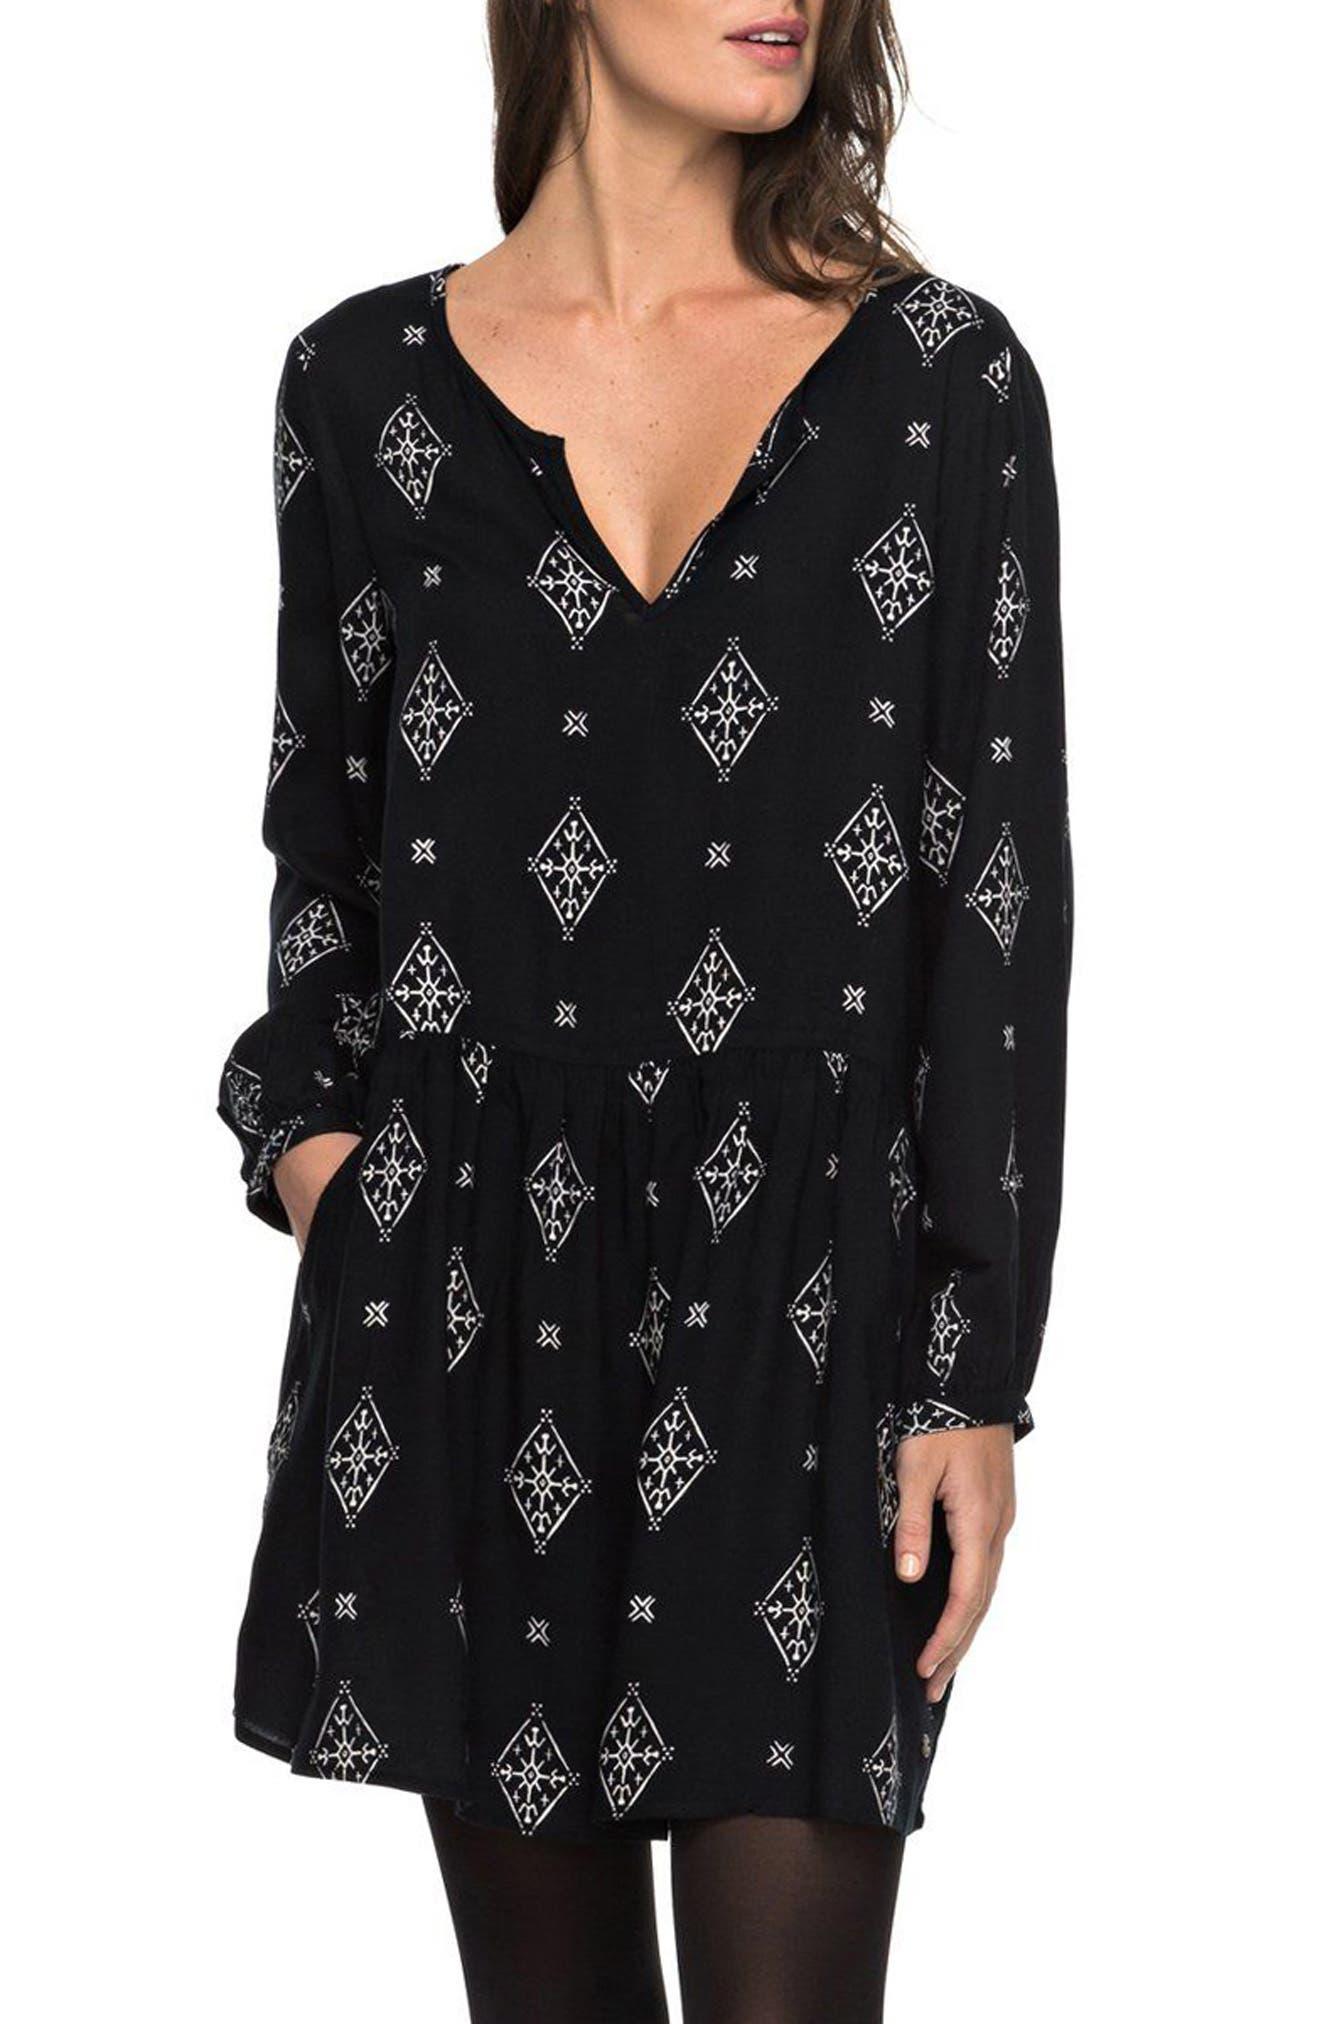 Roxy Sunkissed Daze Print Swing Dress